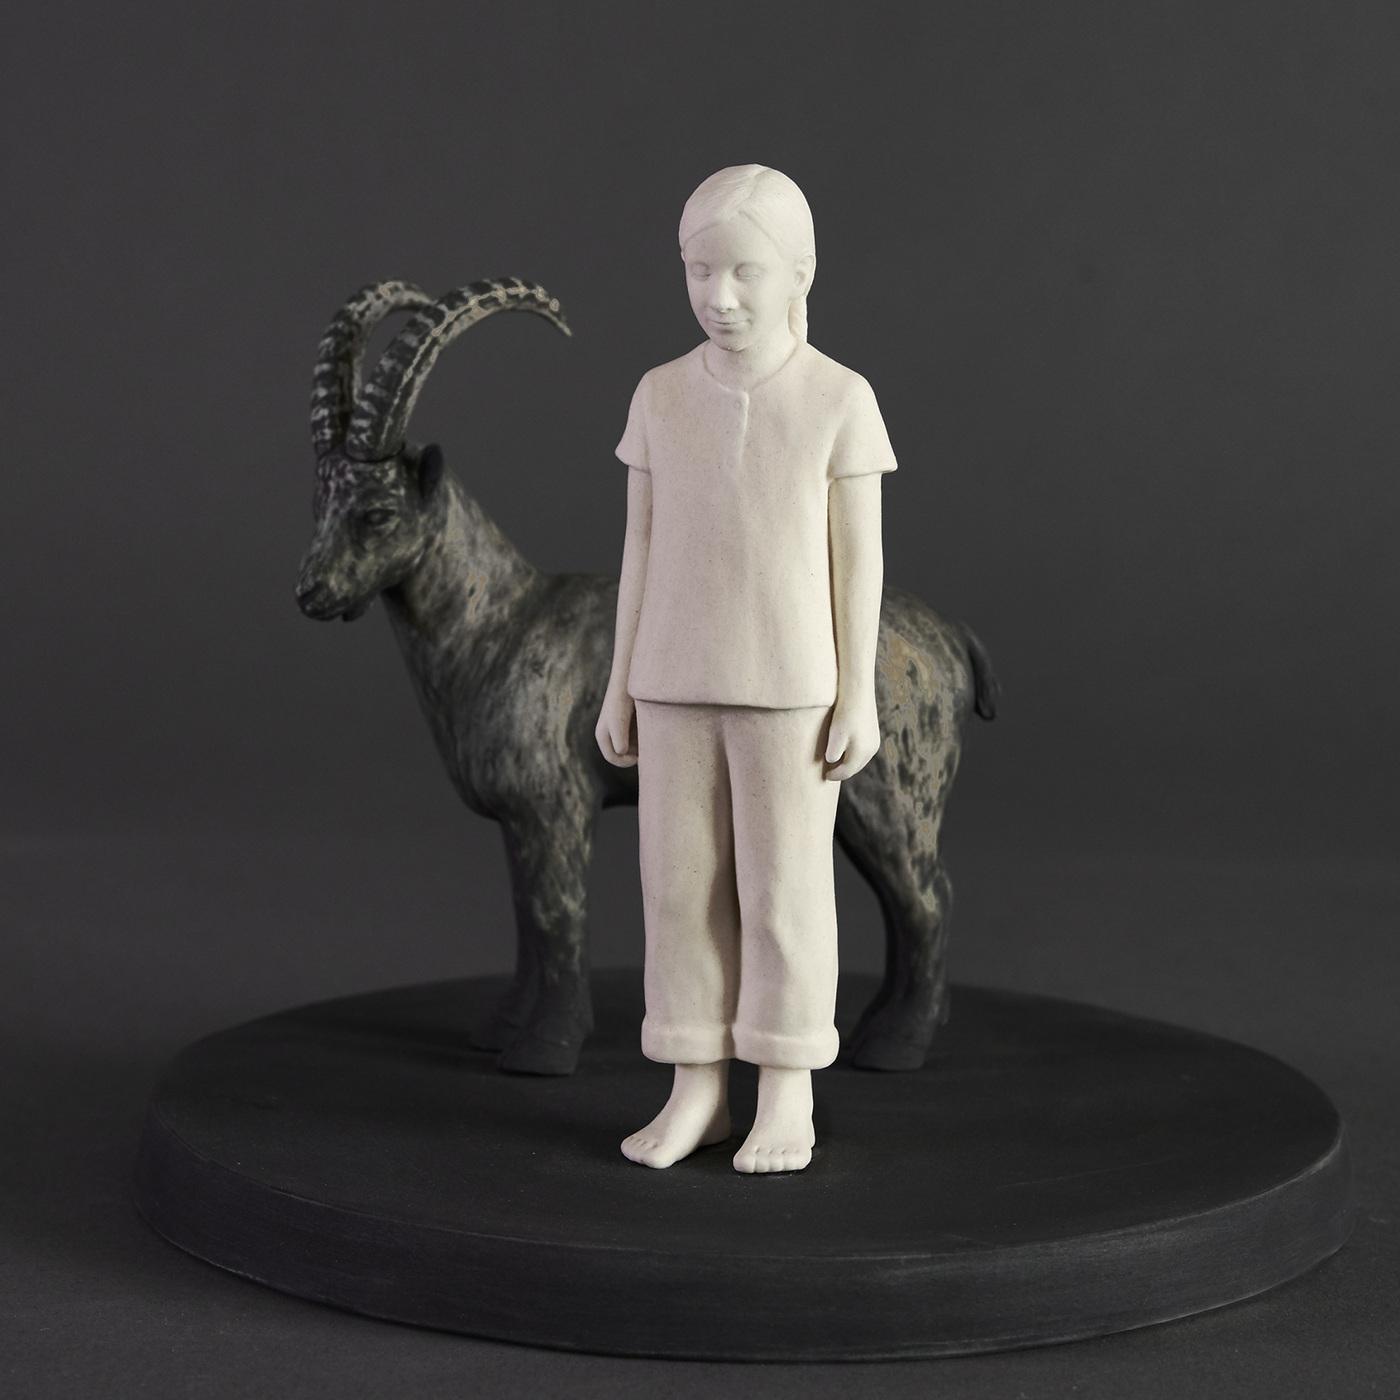 Lina Eriksson-keramikkonstnär - Trust your feet. Porcelain. H:12cm